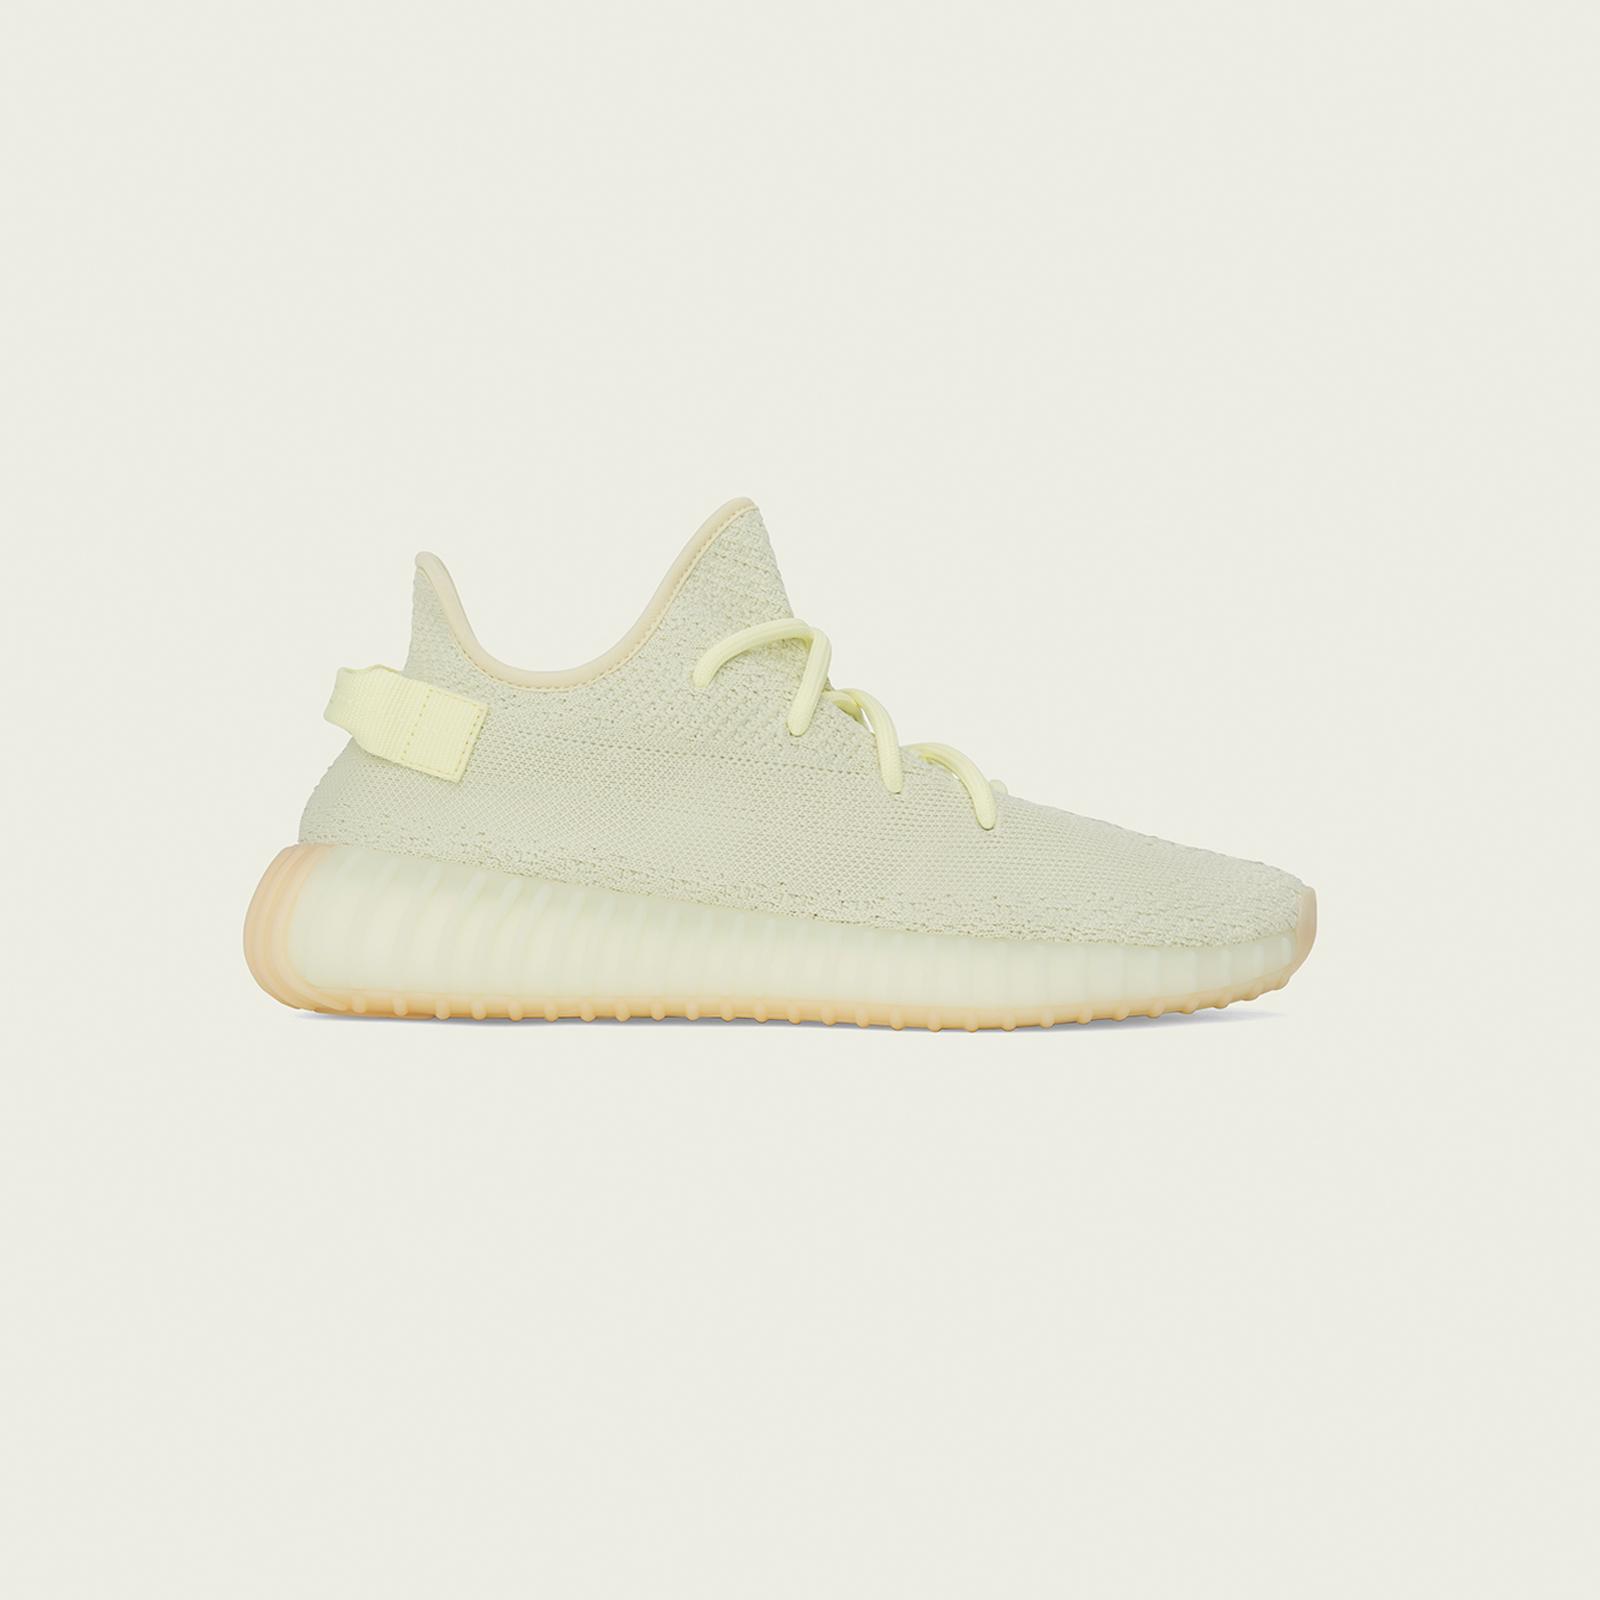 cc73e1291fd0 adidas Yeezy Boost 350 - F36980 - Sneakersnstuff